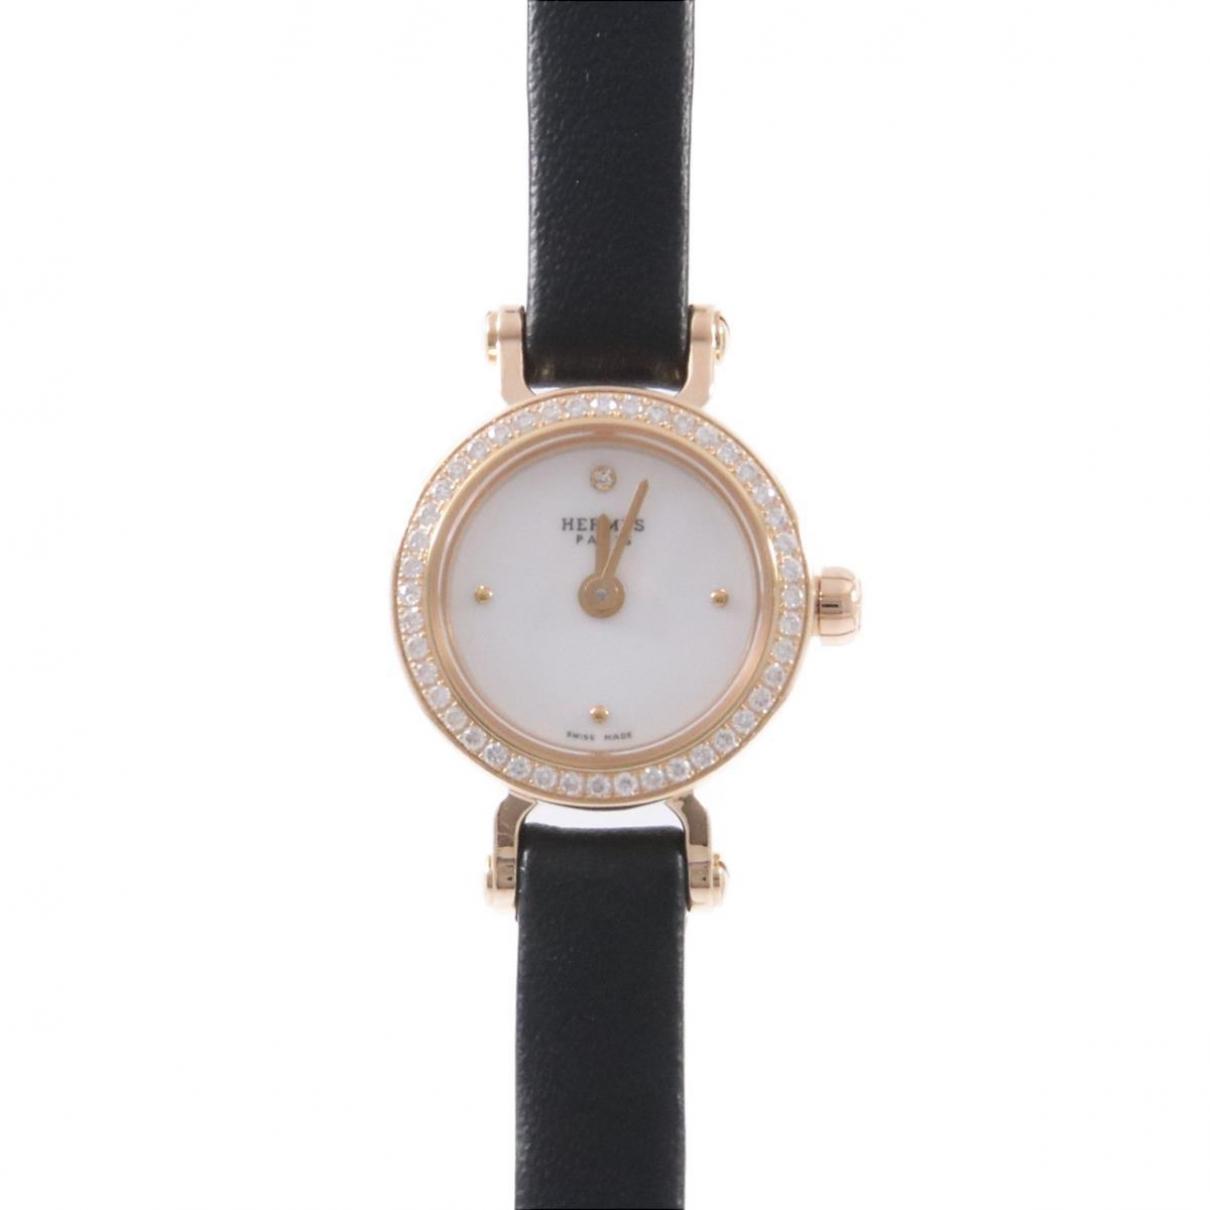 Hermes - Montre   pour femme en or rose - dore